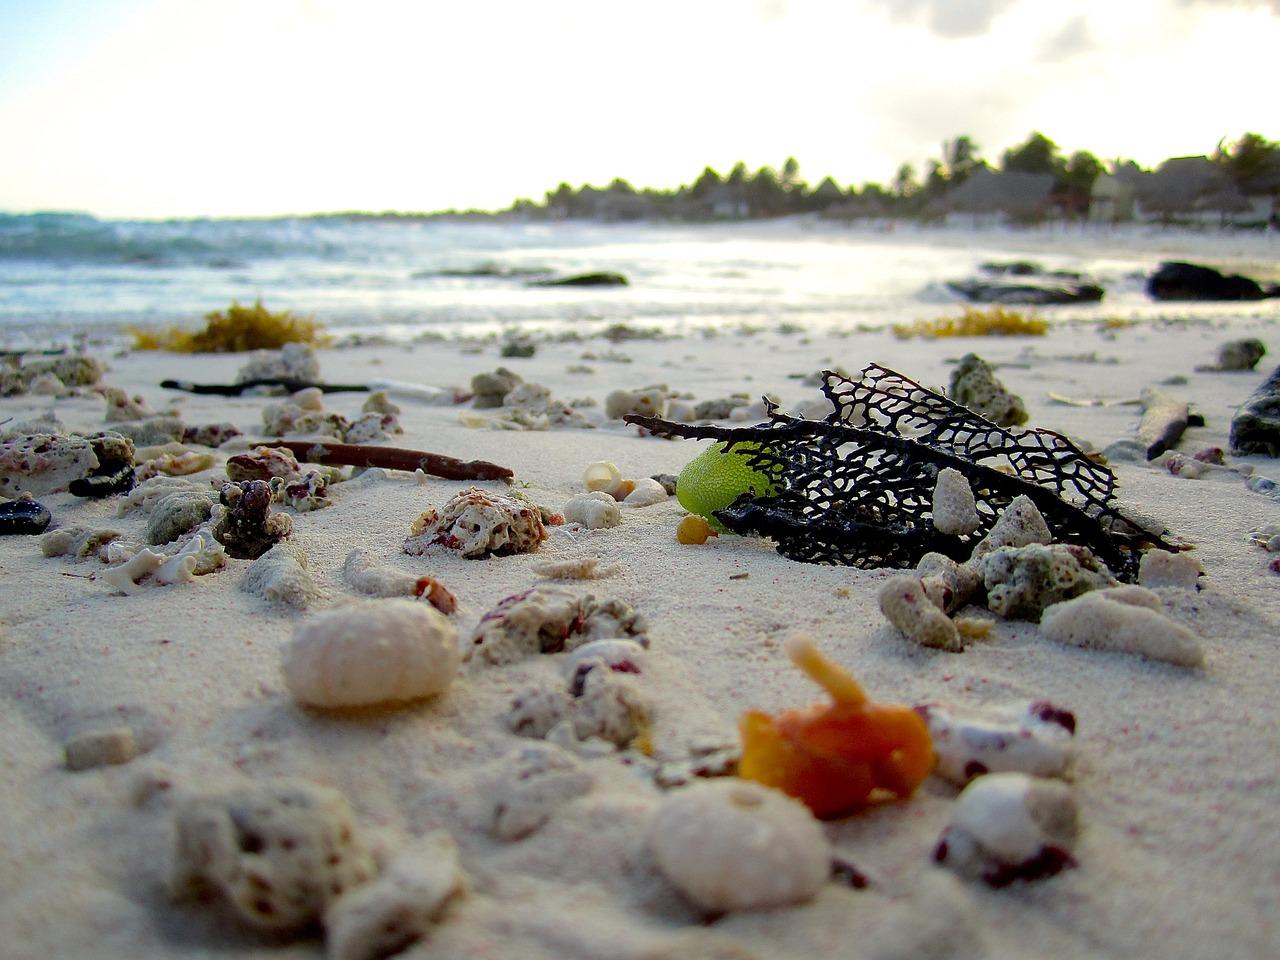 Beach shells shore coral travel